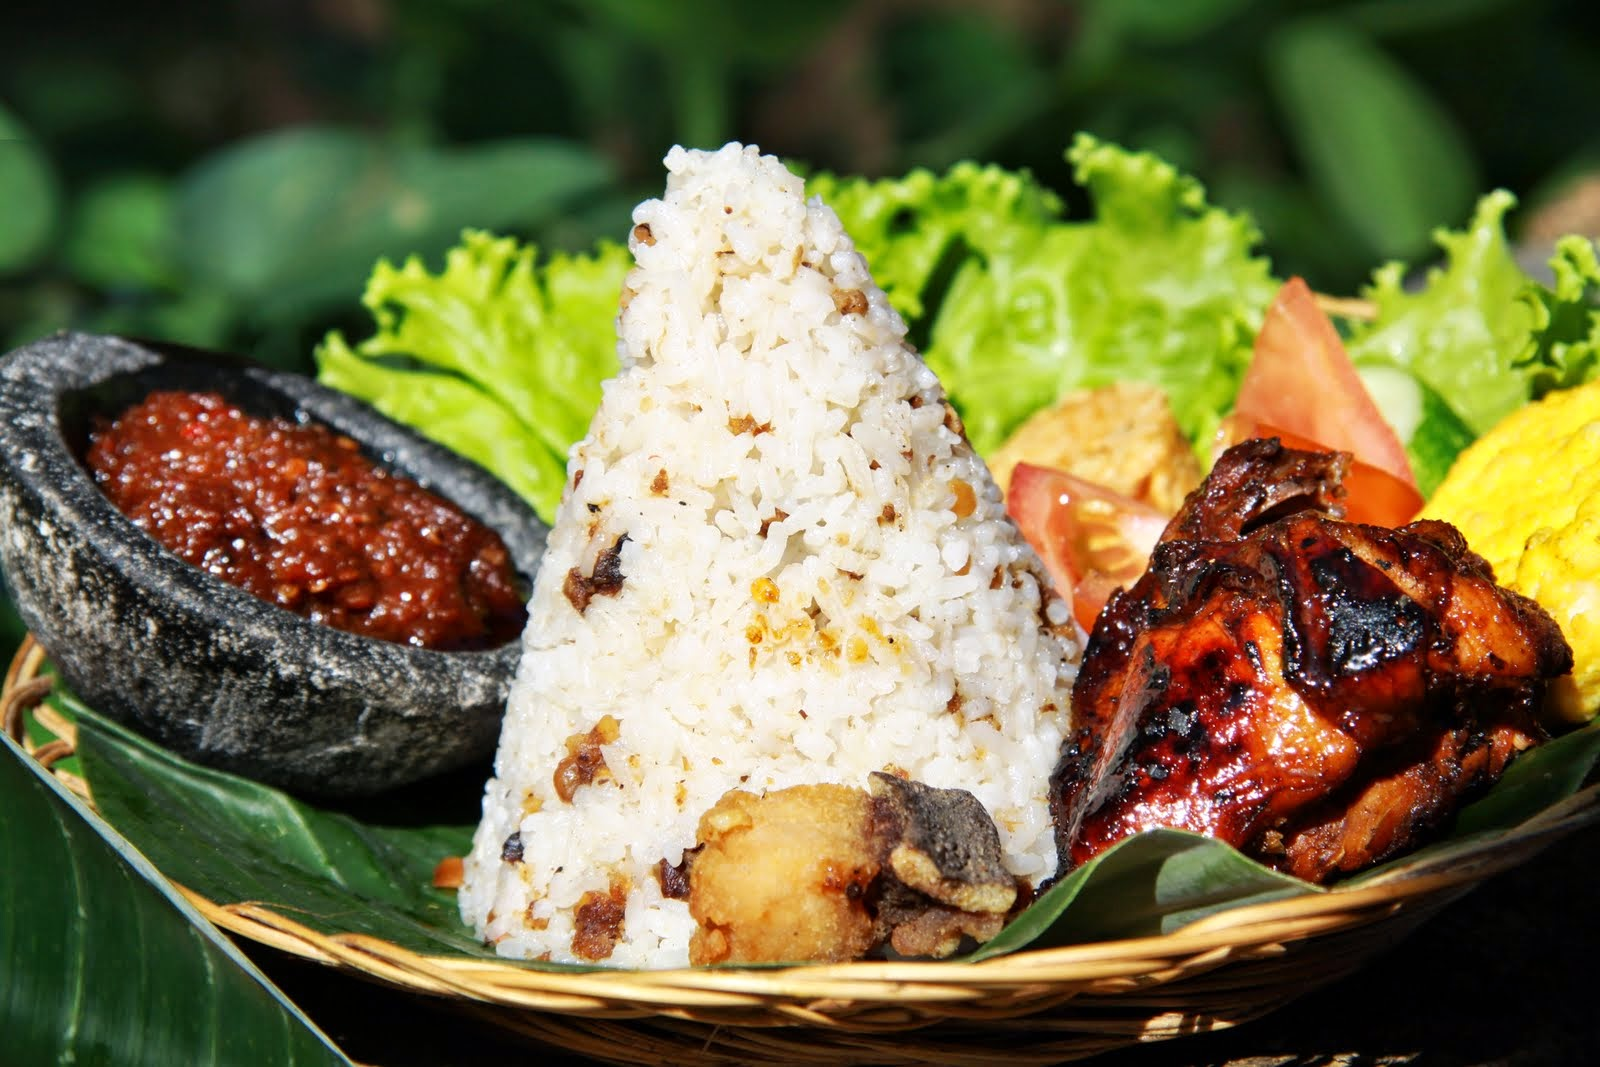 Resep Nasi Liwet Teri khas Sunda Gurih  Harian Resep